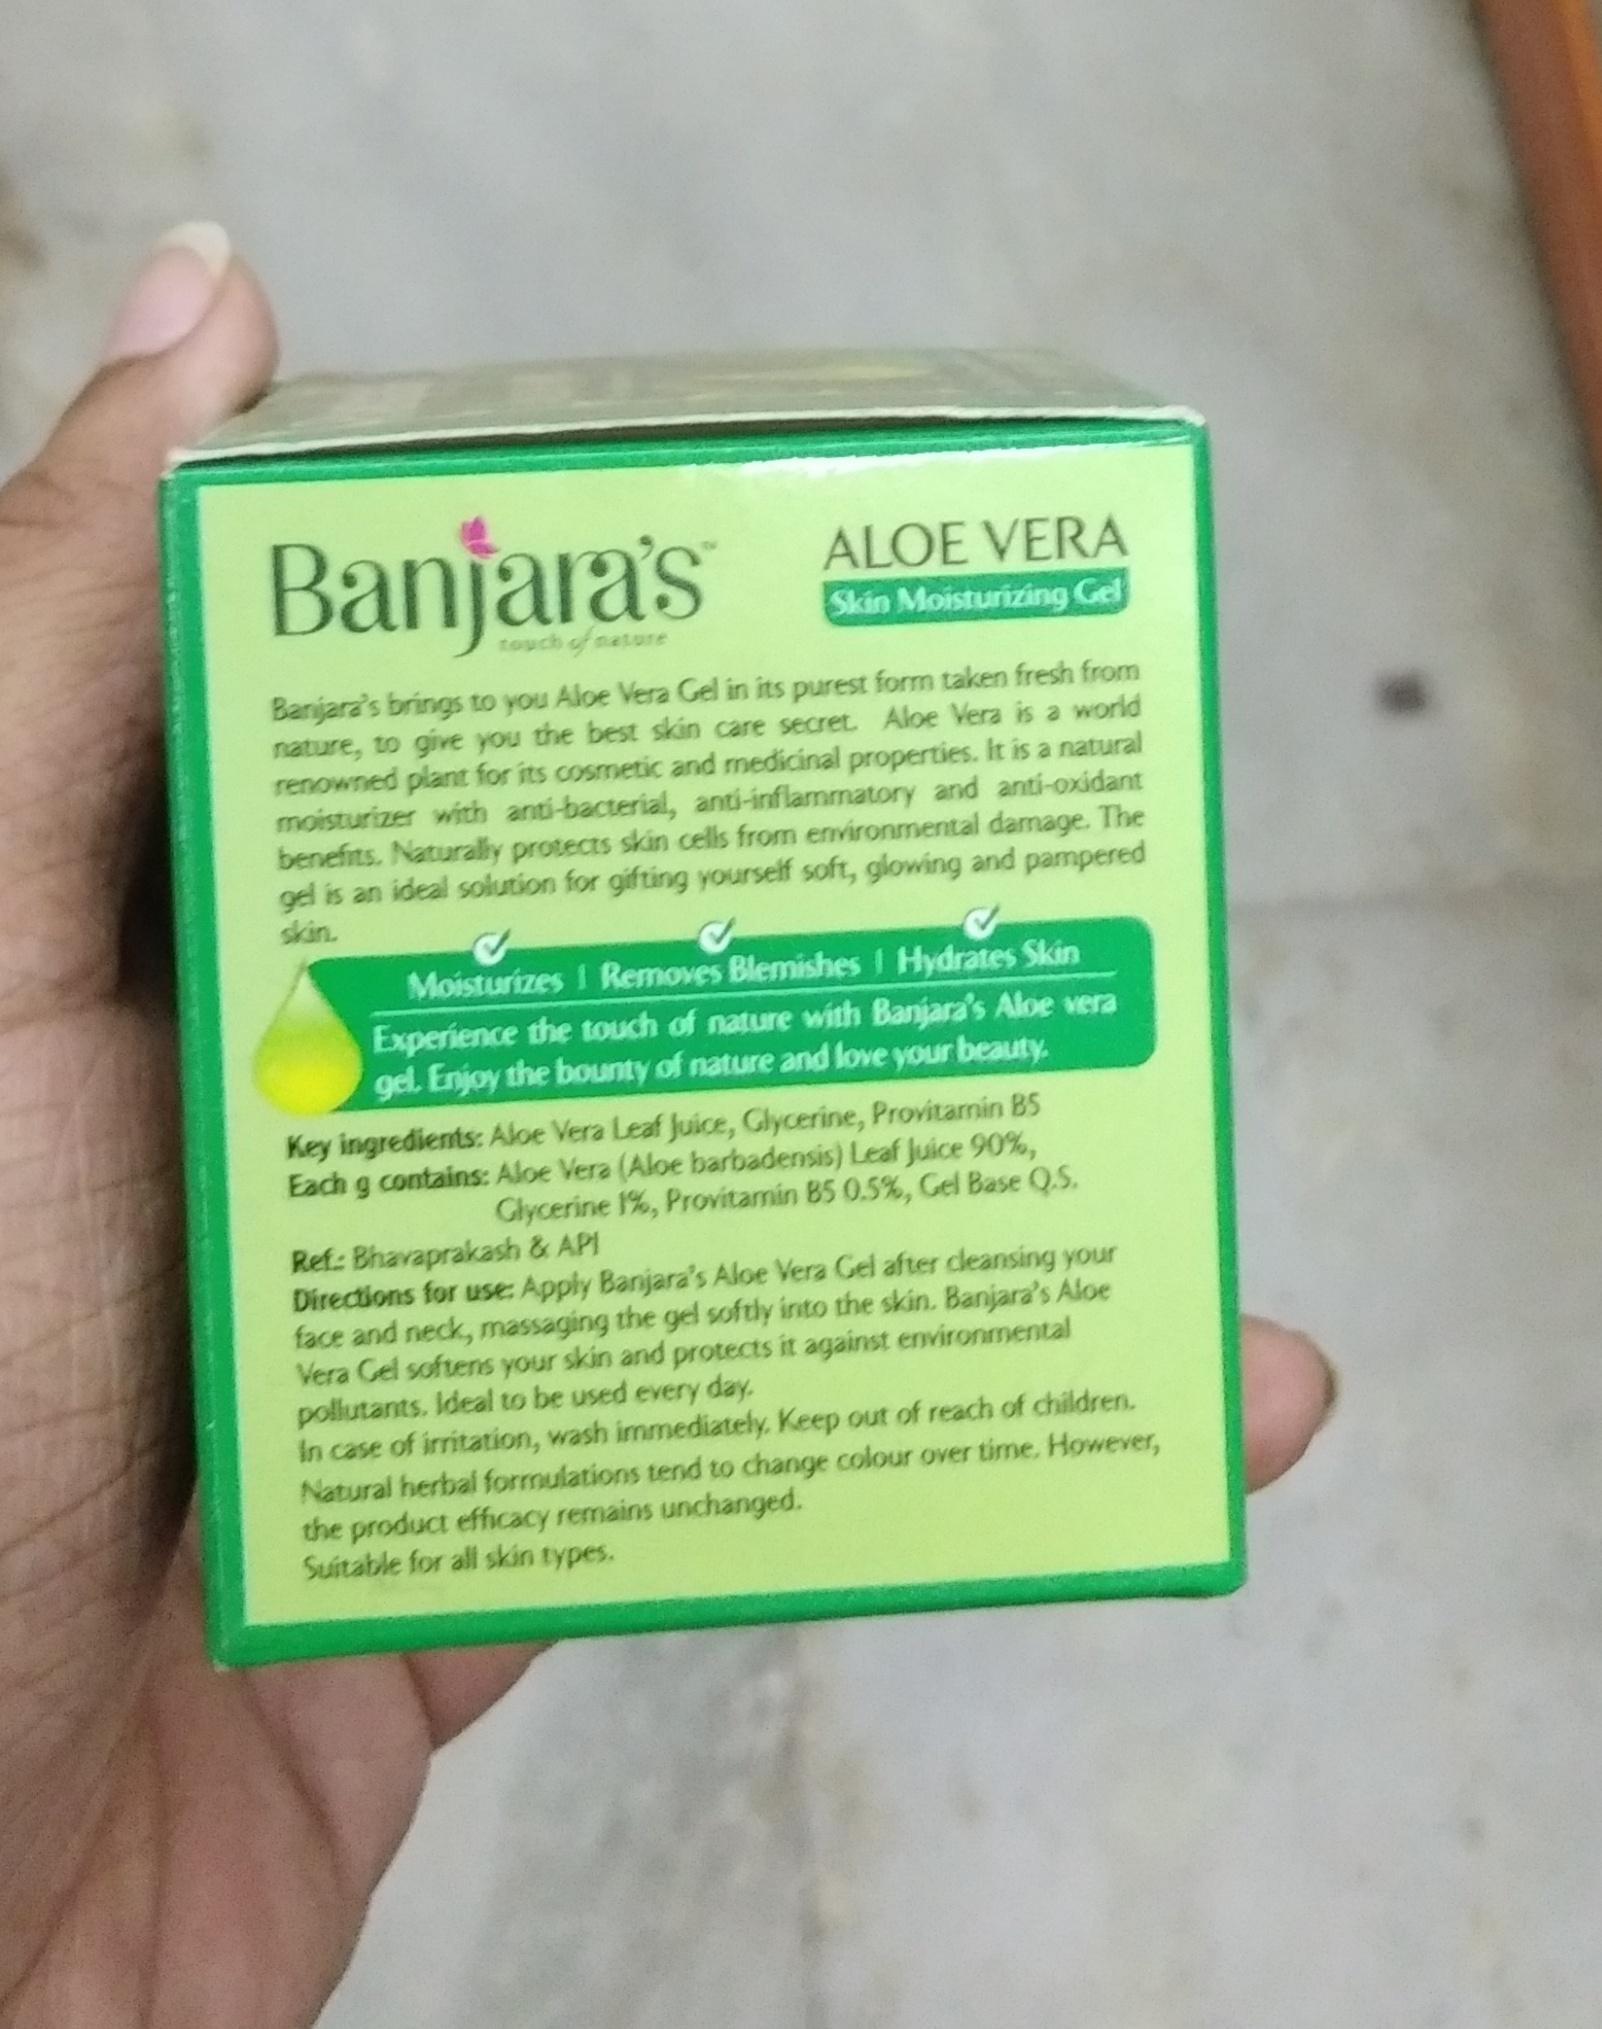 Banjara's Aloe Vera Skin Moisturizing Gel-Amazing product-By Nasreen-2